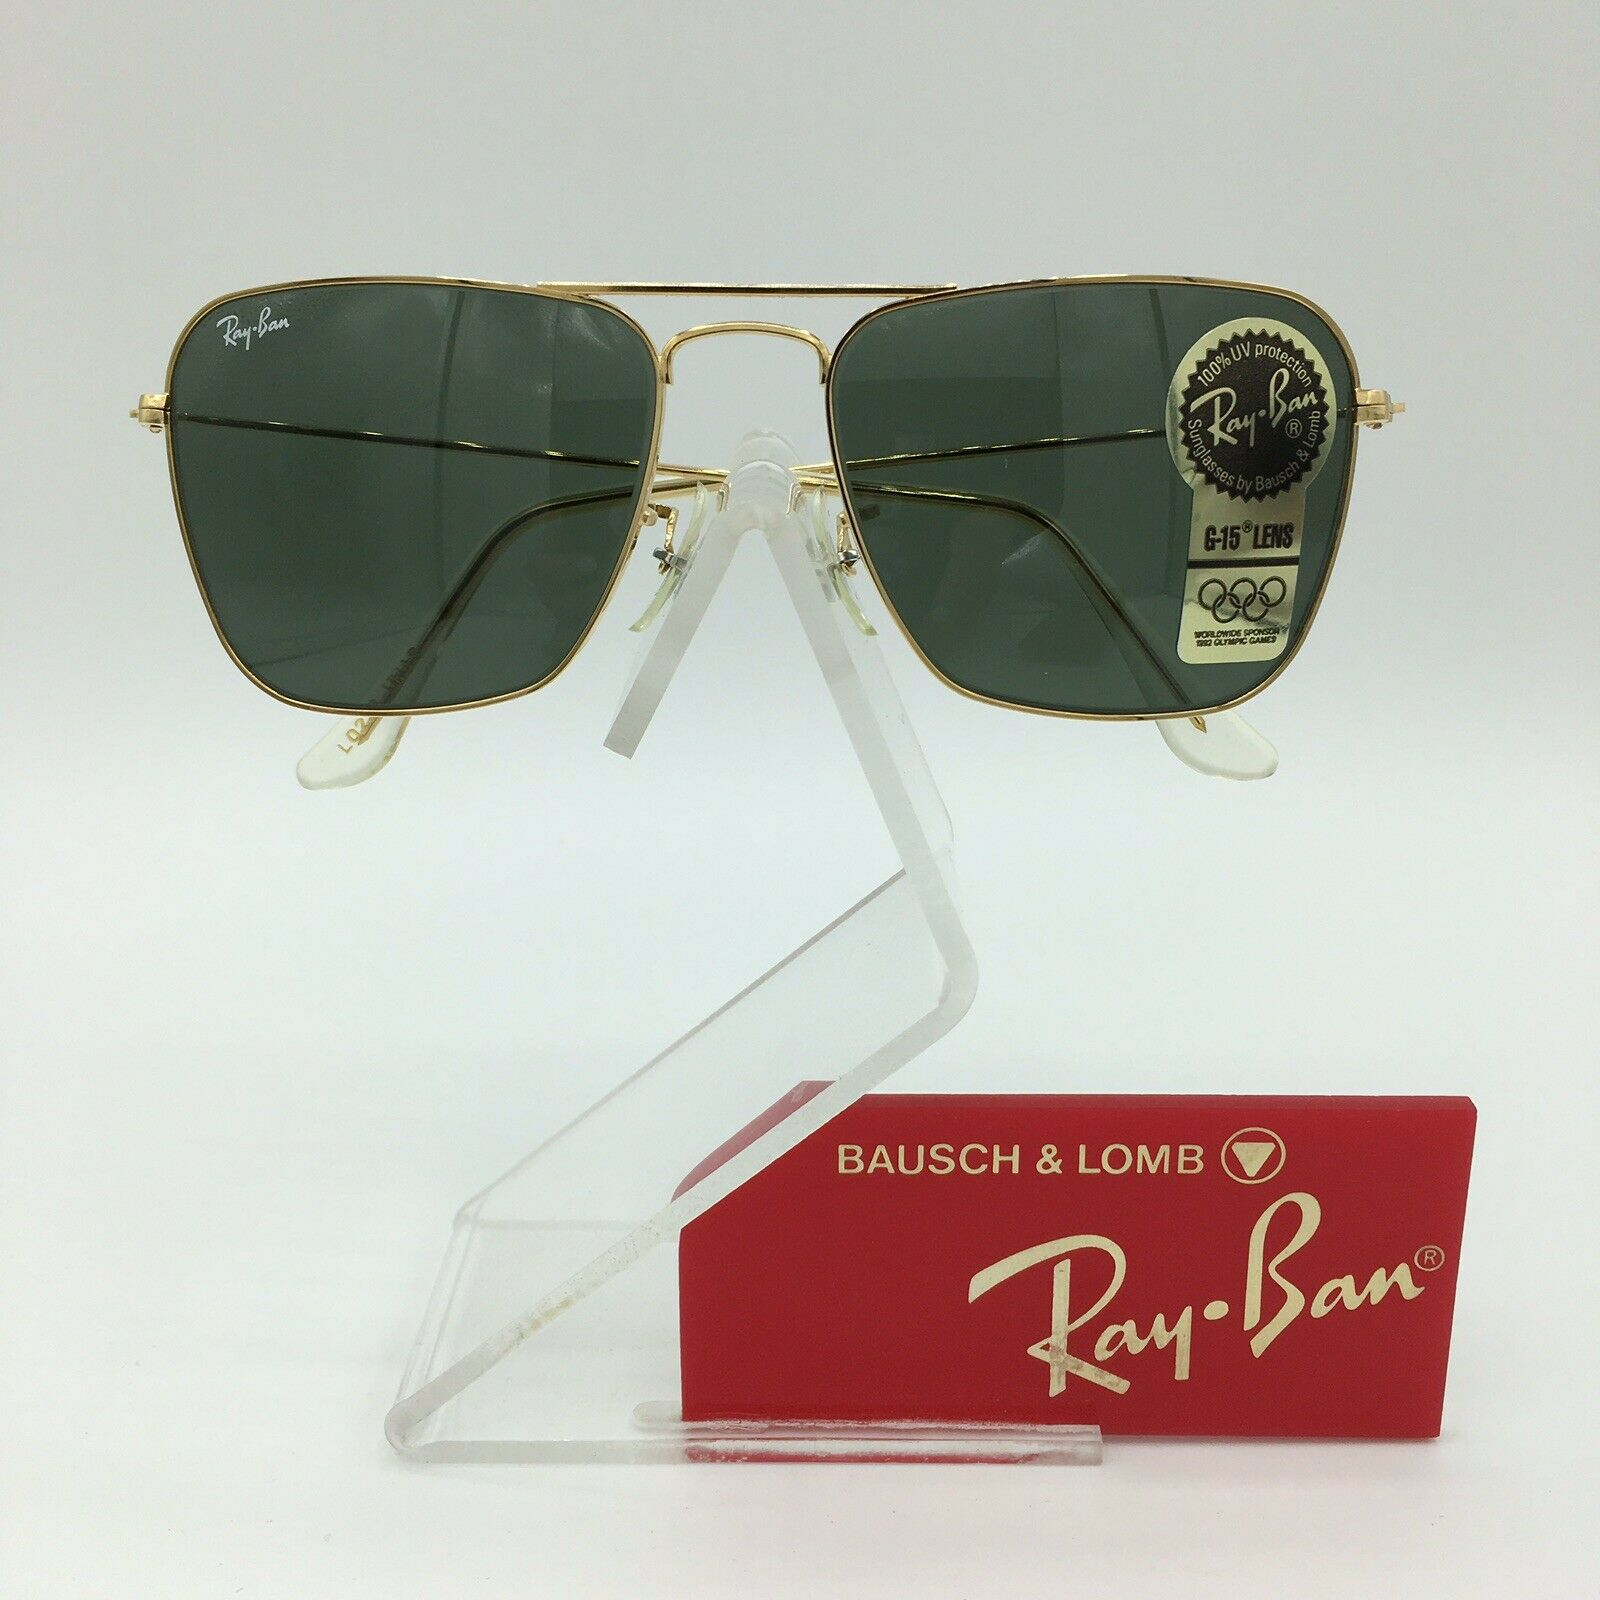 Ray Ban CARAVAN G 15 B&L 52mm